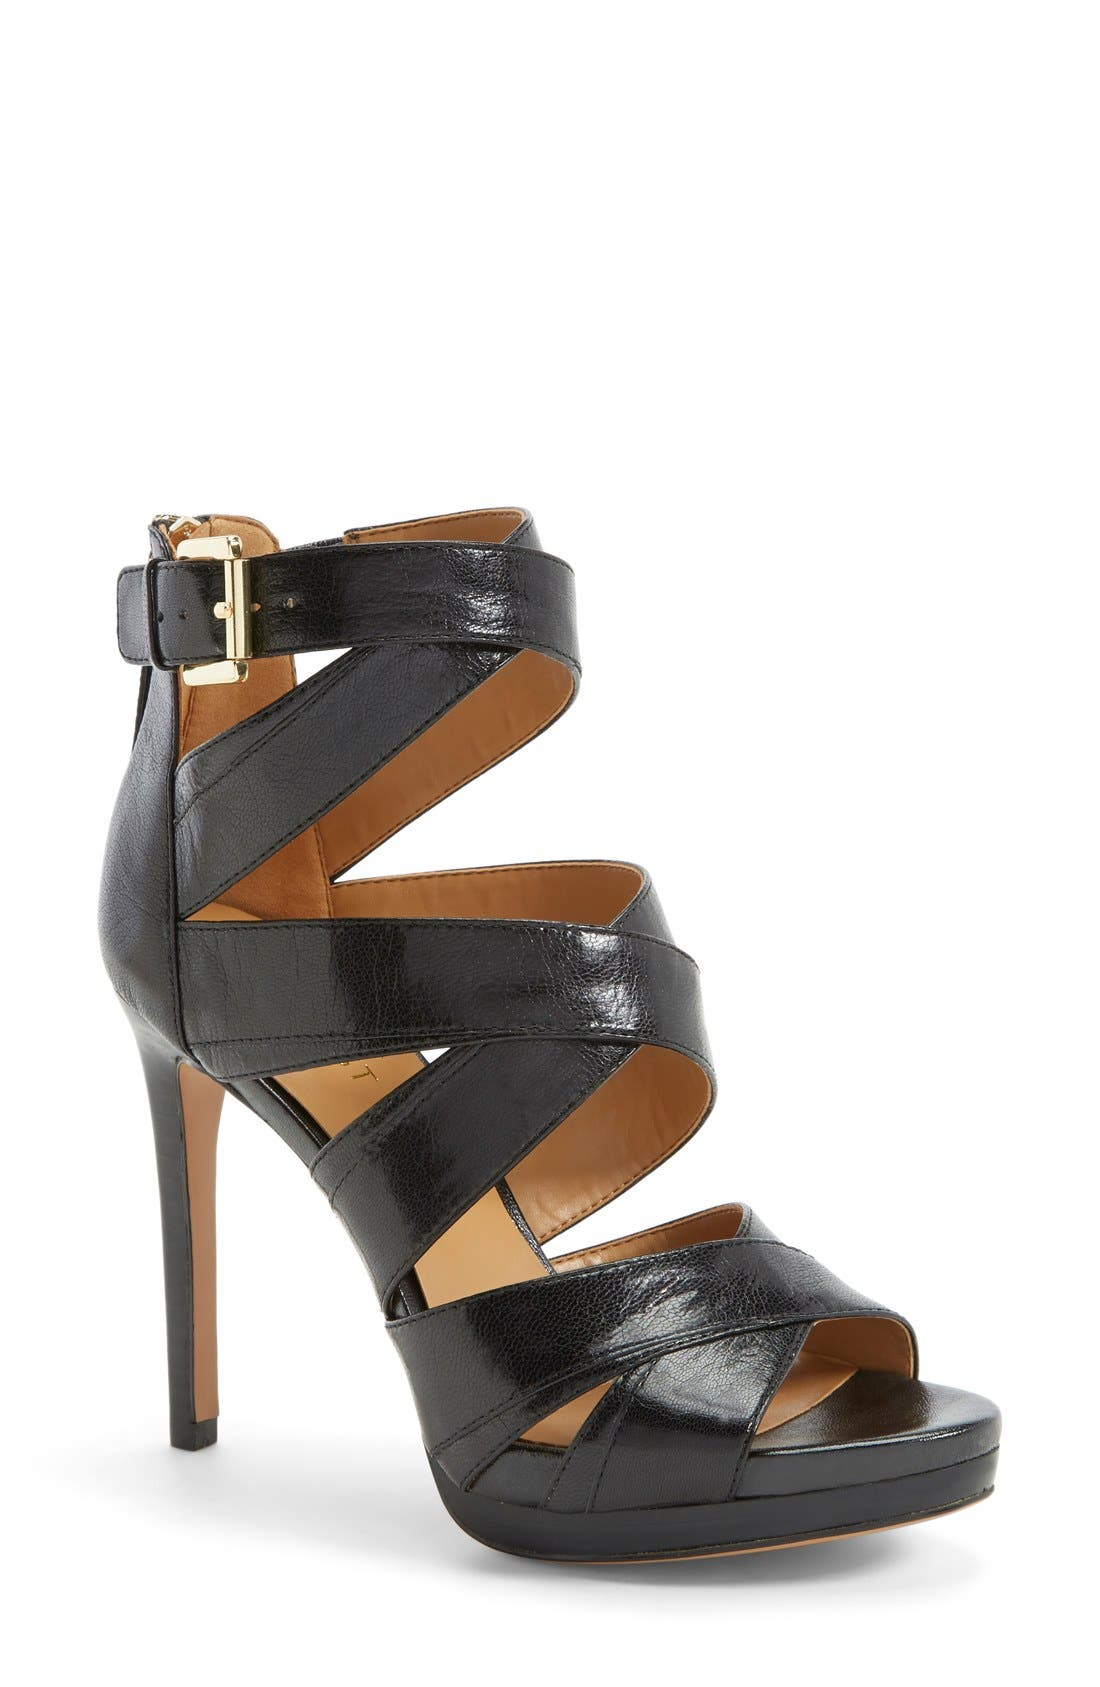 'Bonjorno' Platform Sandal,                             Main thumbnail 1, color,                             001